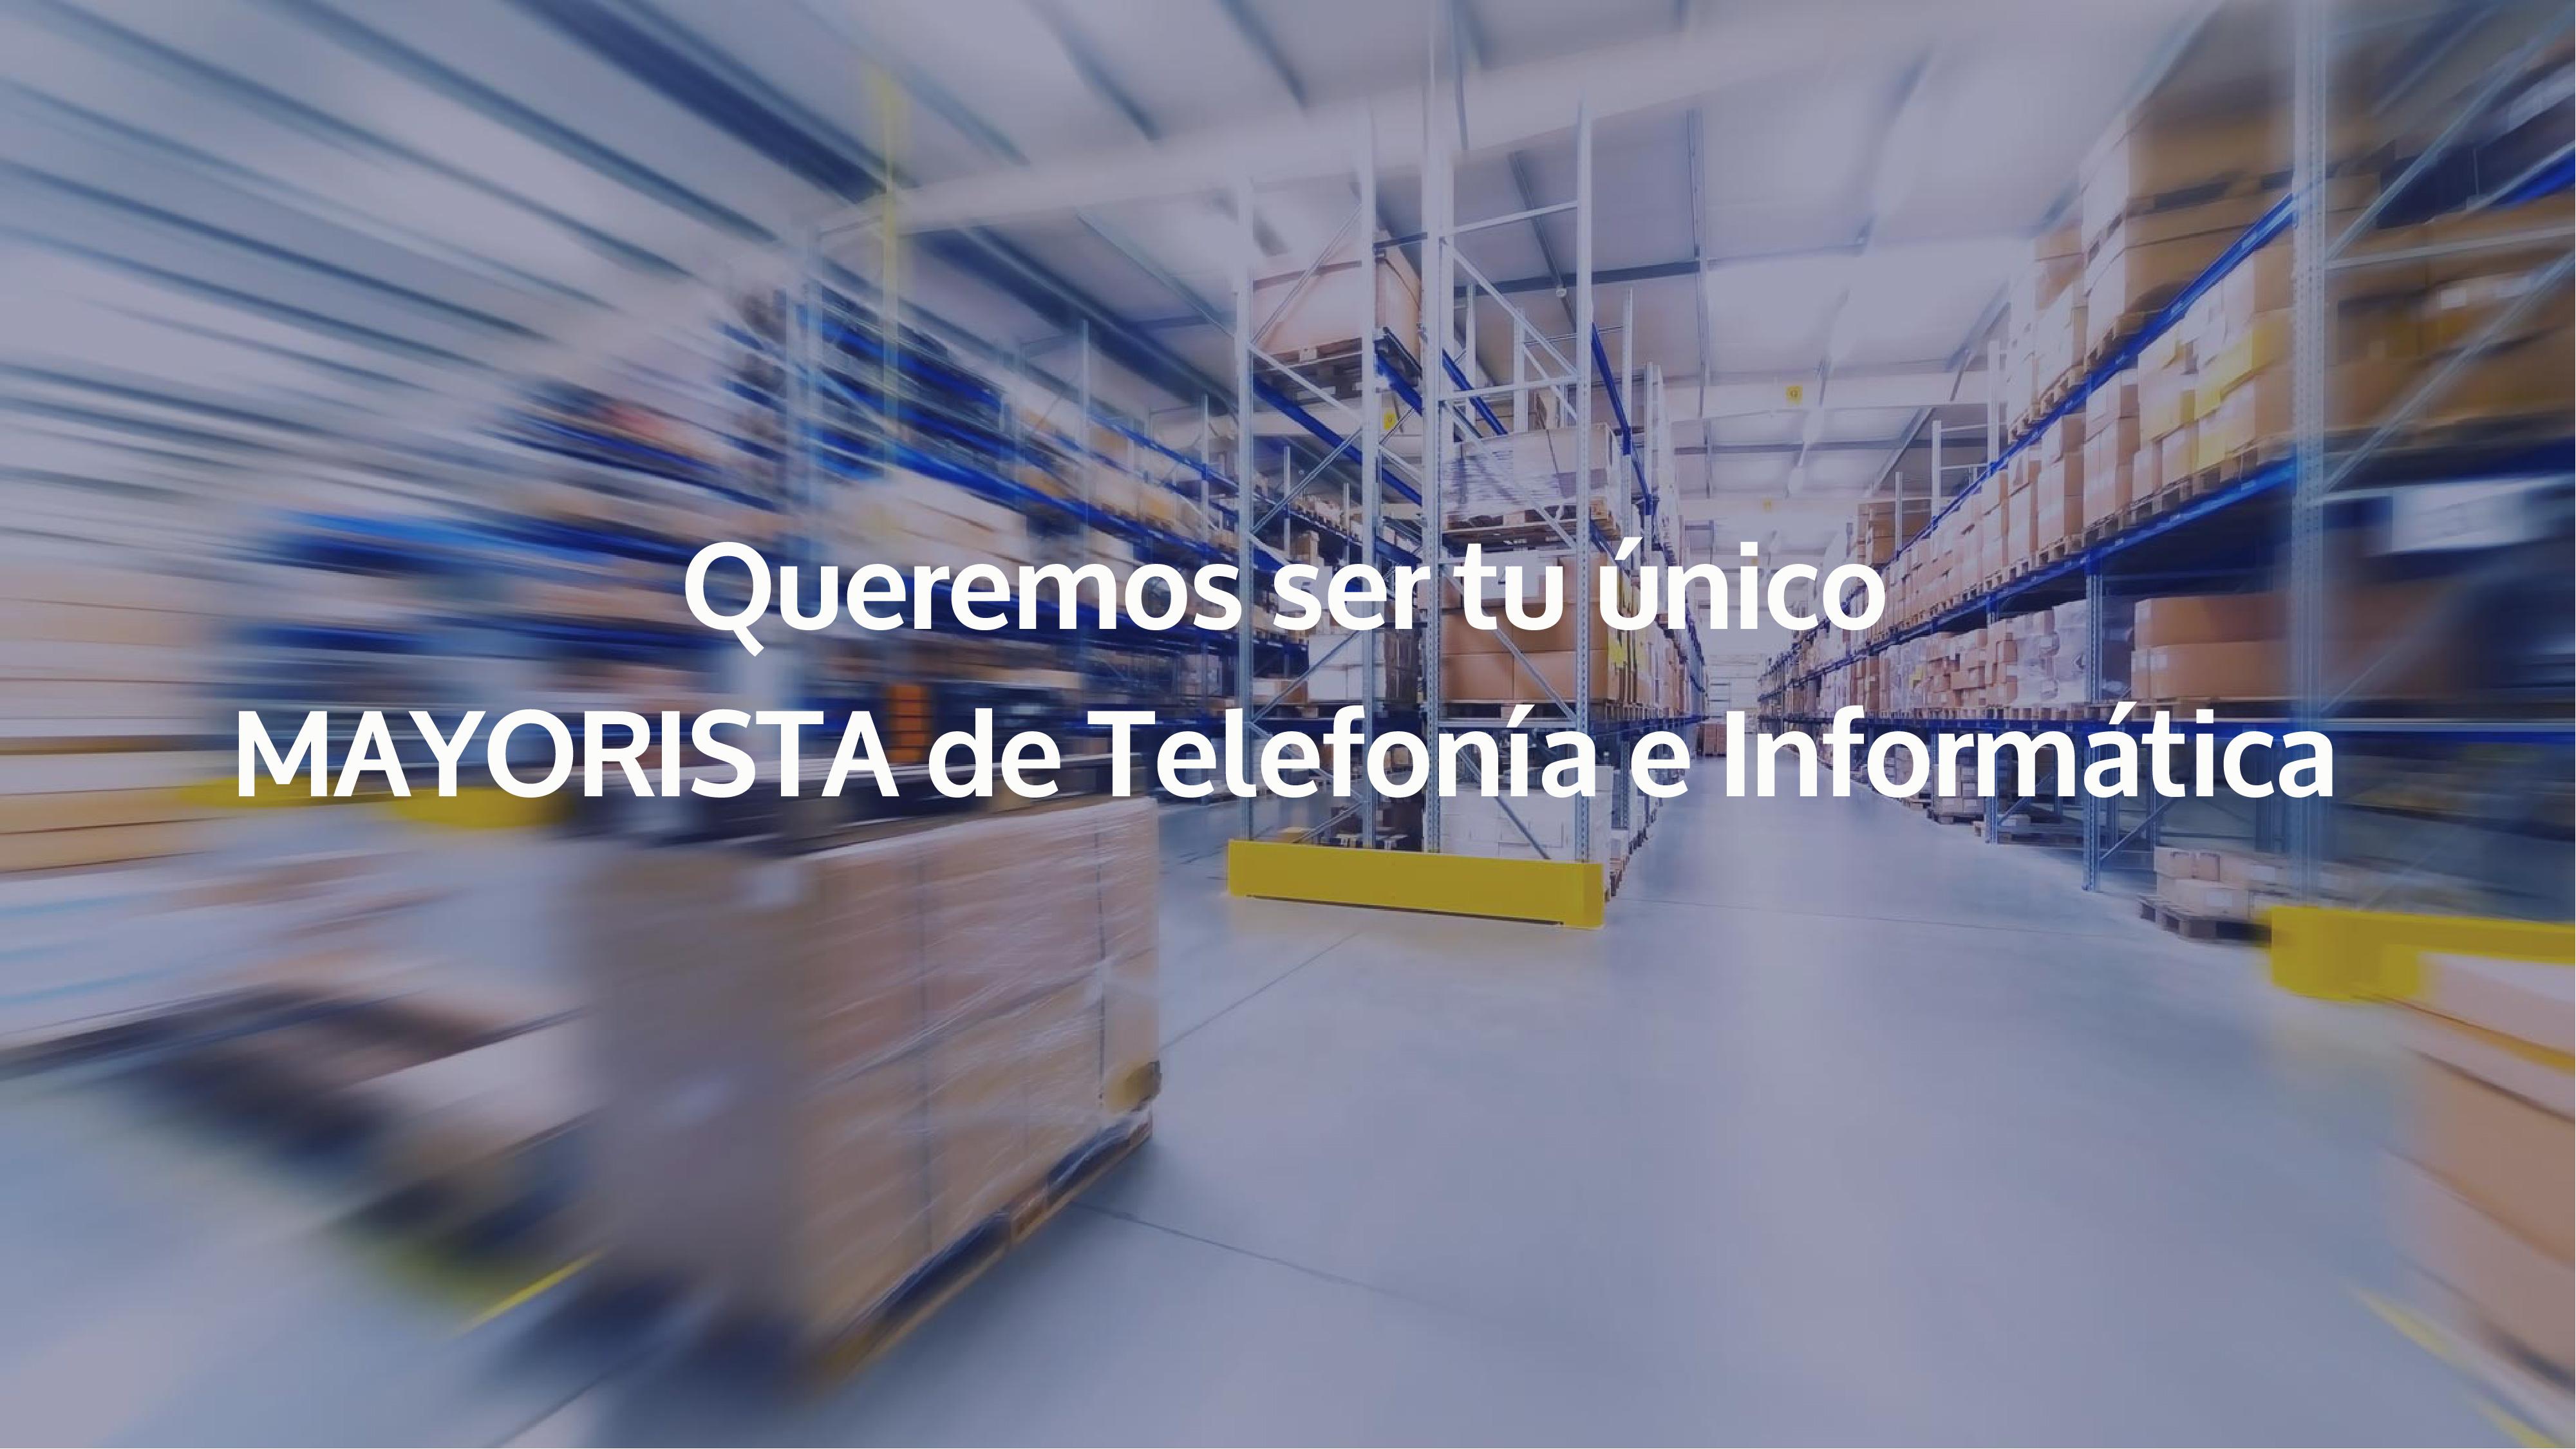 Mayorista de Telefonia e Informatica en España